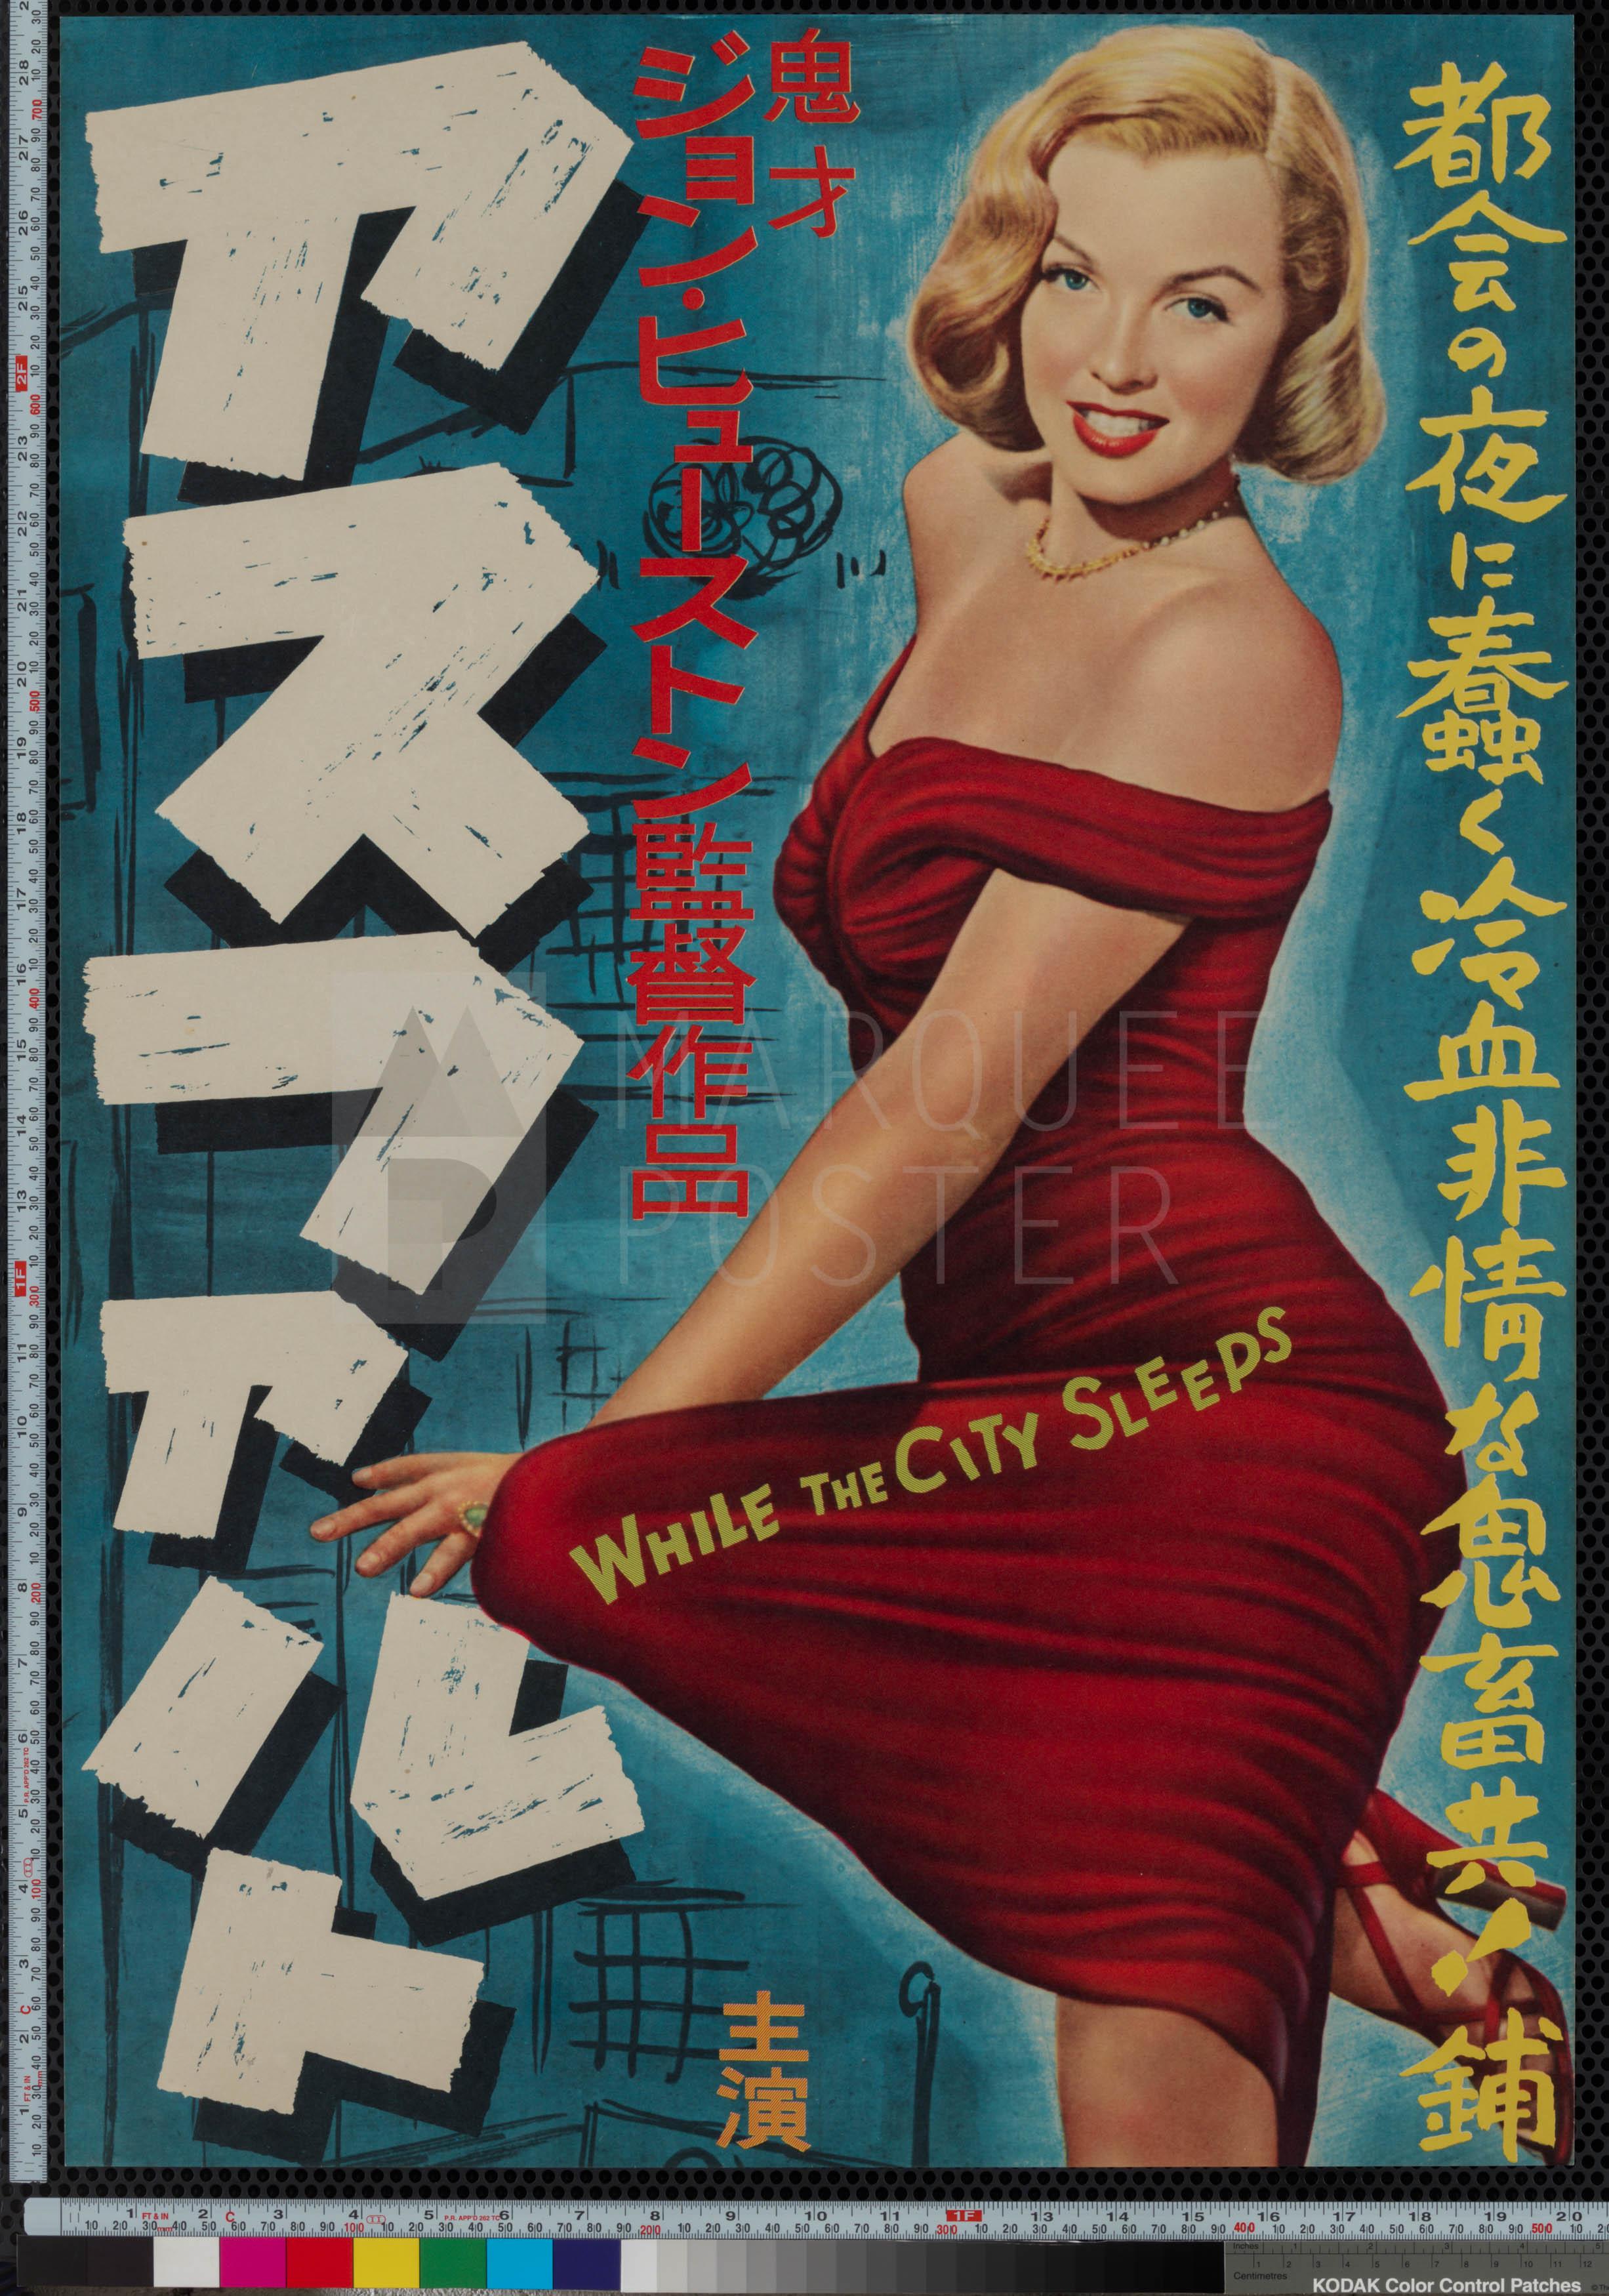 70-asphalt-jungle-japanese-stb-1954-02